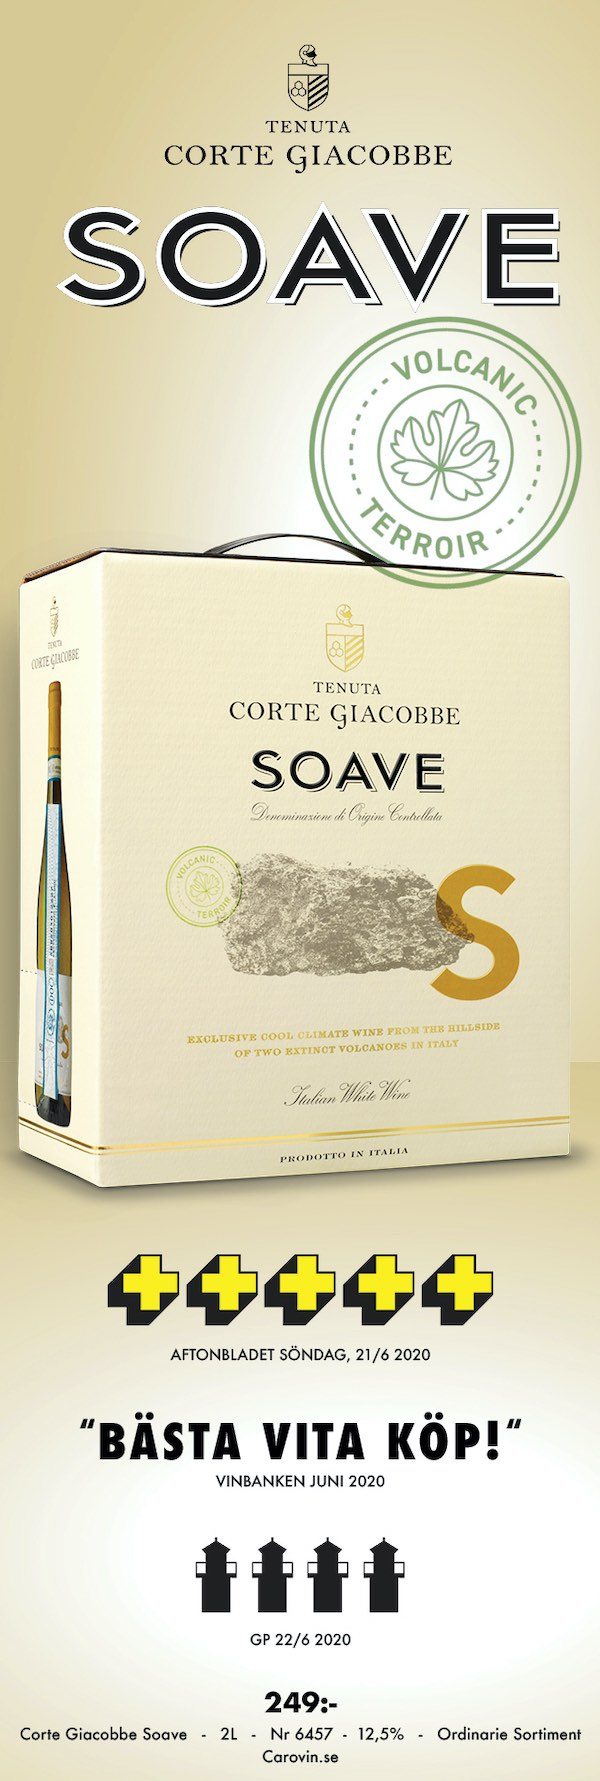 Vitt vin bag in box från Italien: Corte Soave 249 kr